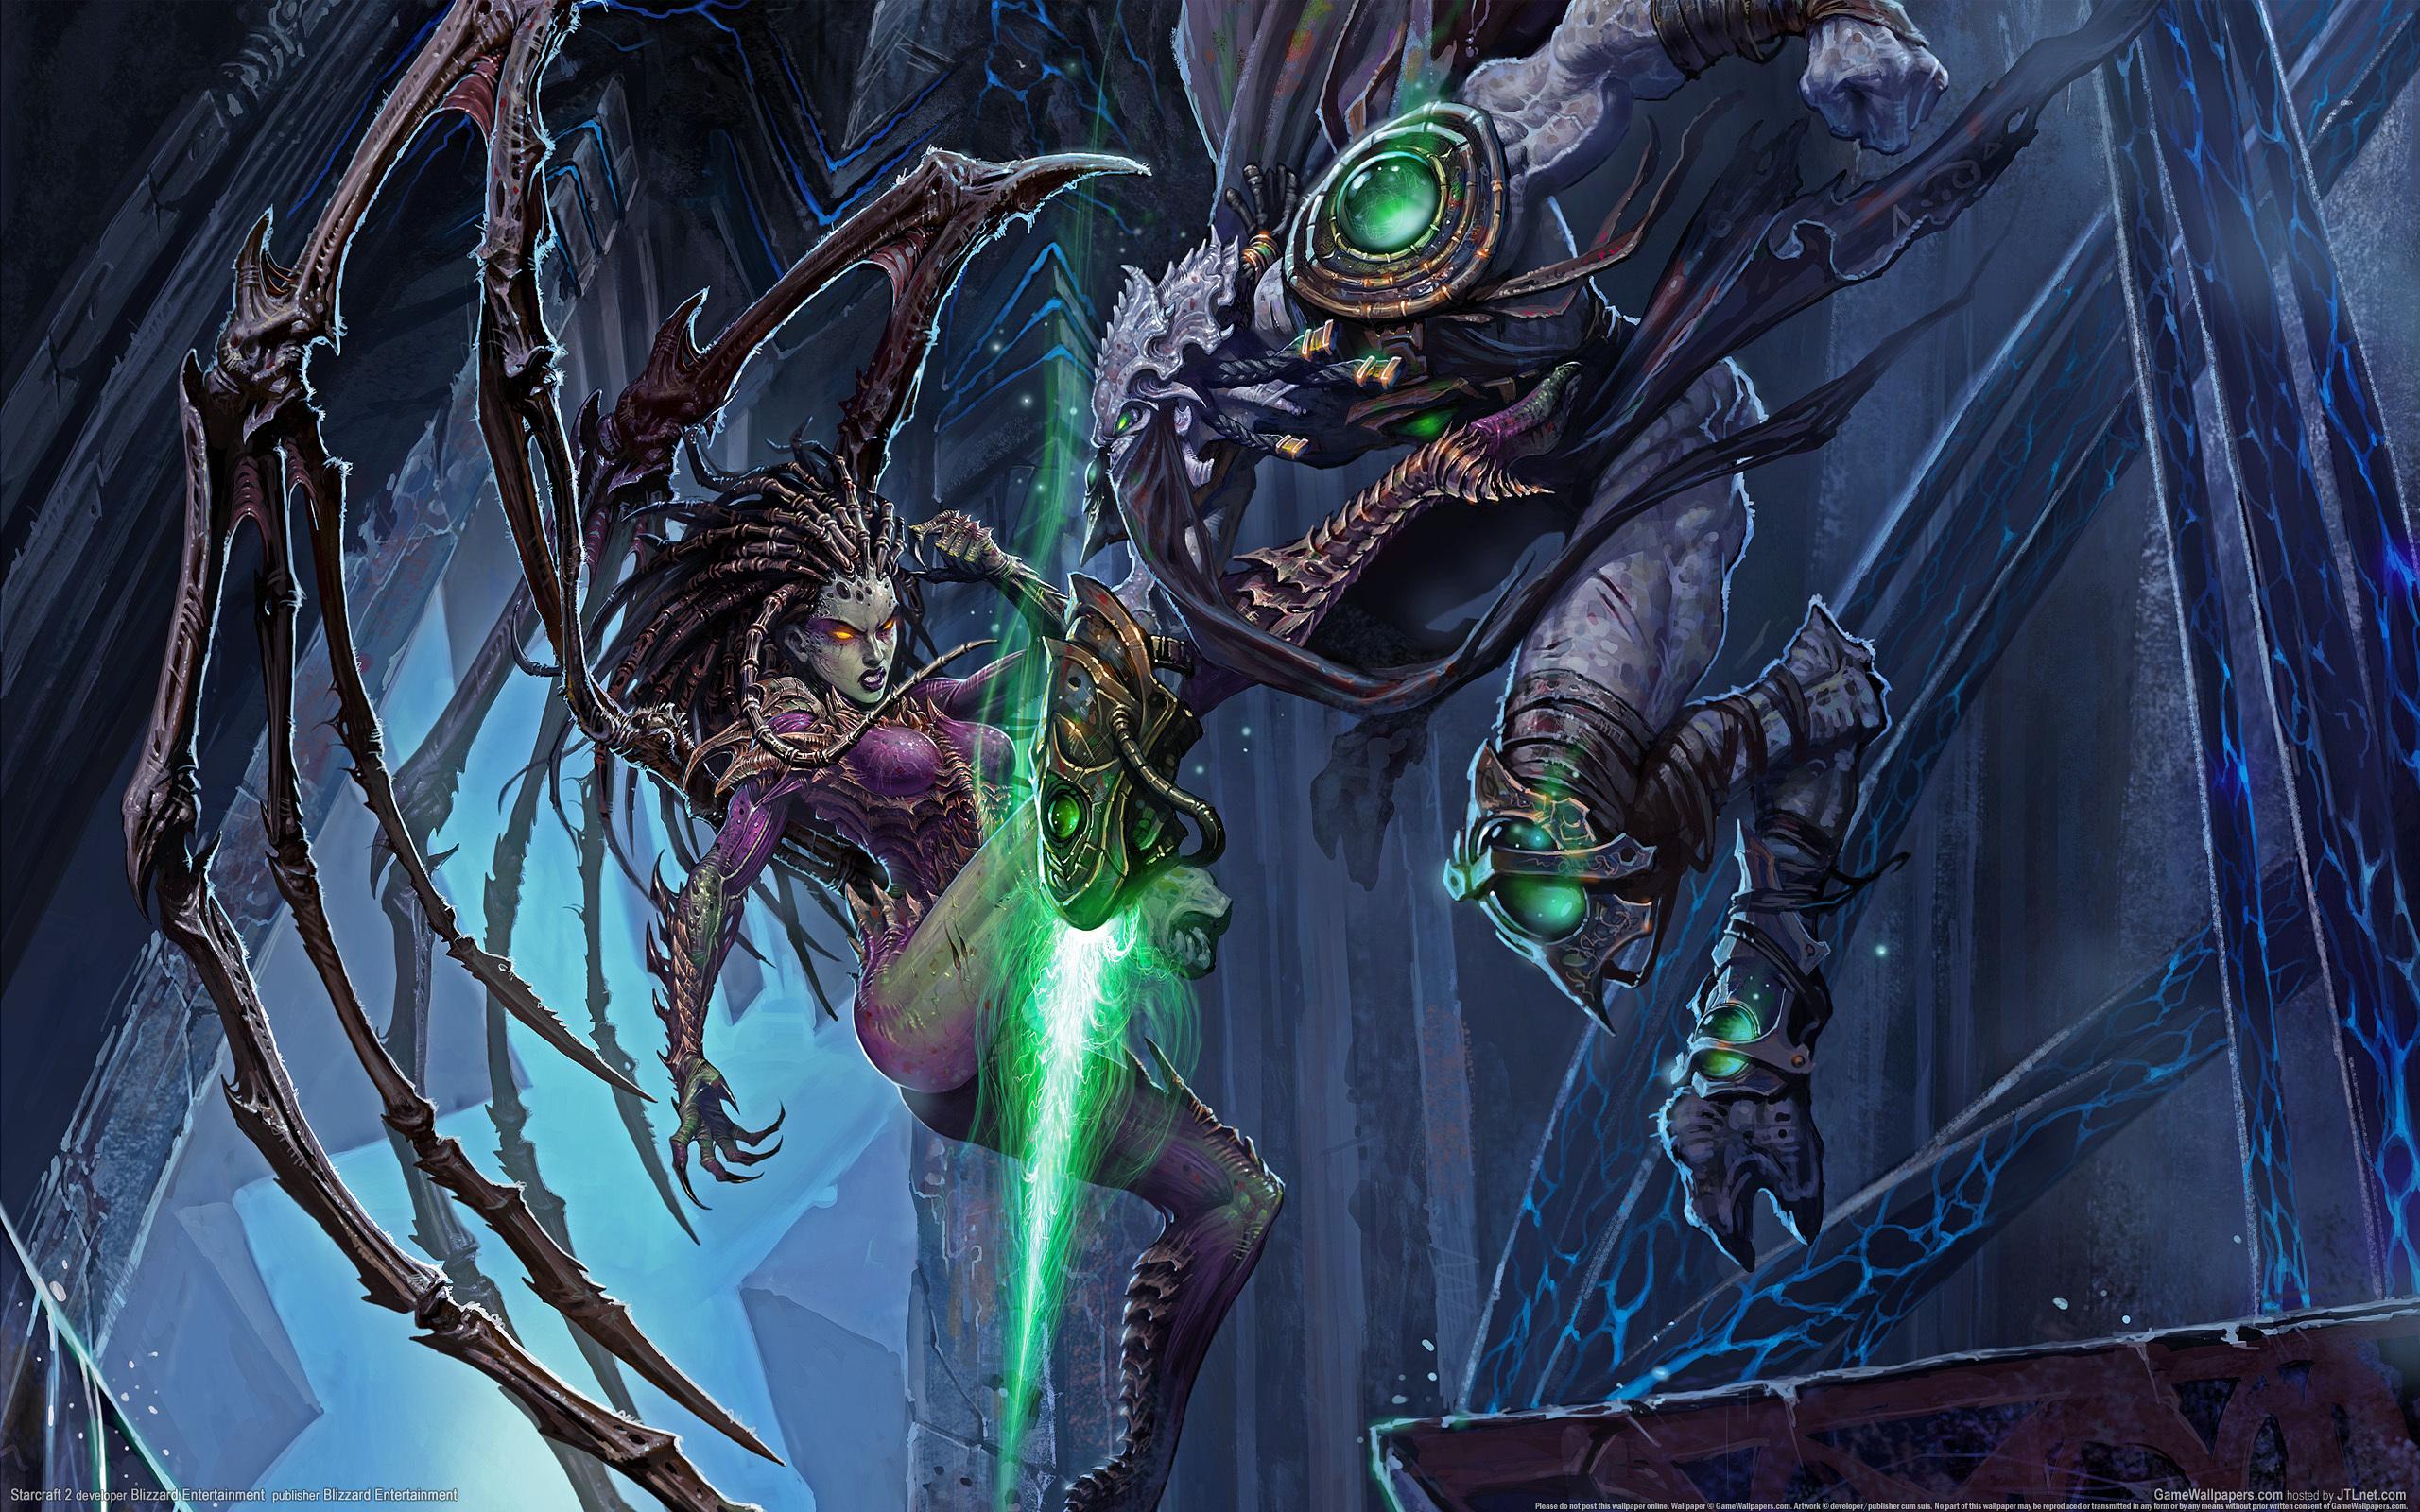 Wallpaper StarCraft StarCraft 2 Sarah Kerrigan Queen of Blades 2560x1600